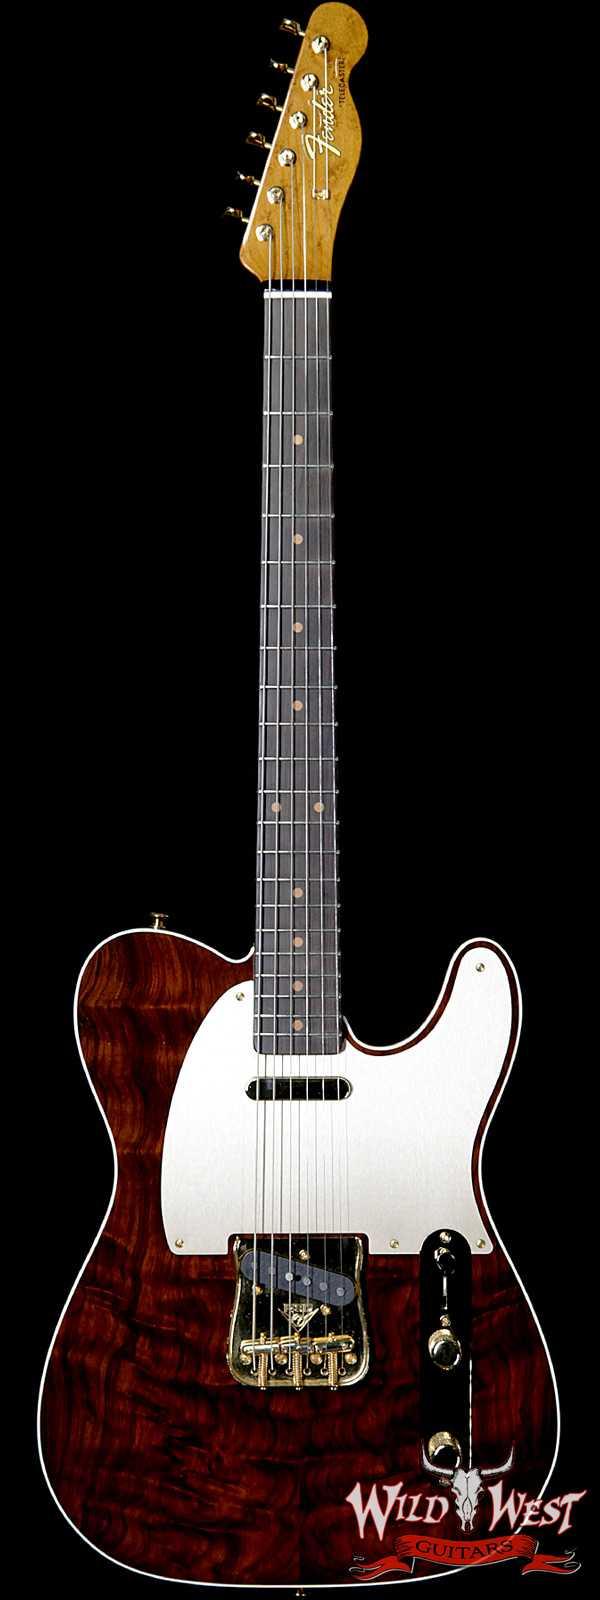 2018 Fender Custom Shop Artisan Telecaster Figured Rosewood Top Roasted Birdseye Maple Neck African Blackwood Board Natural